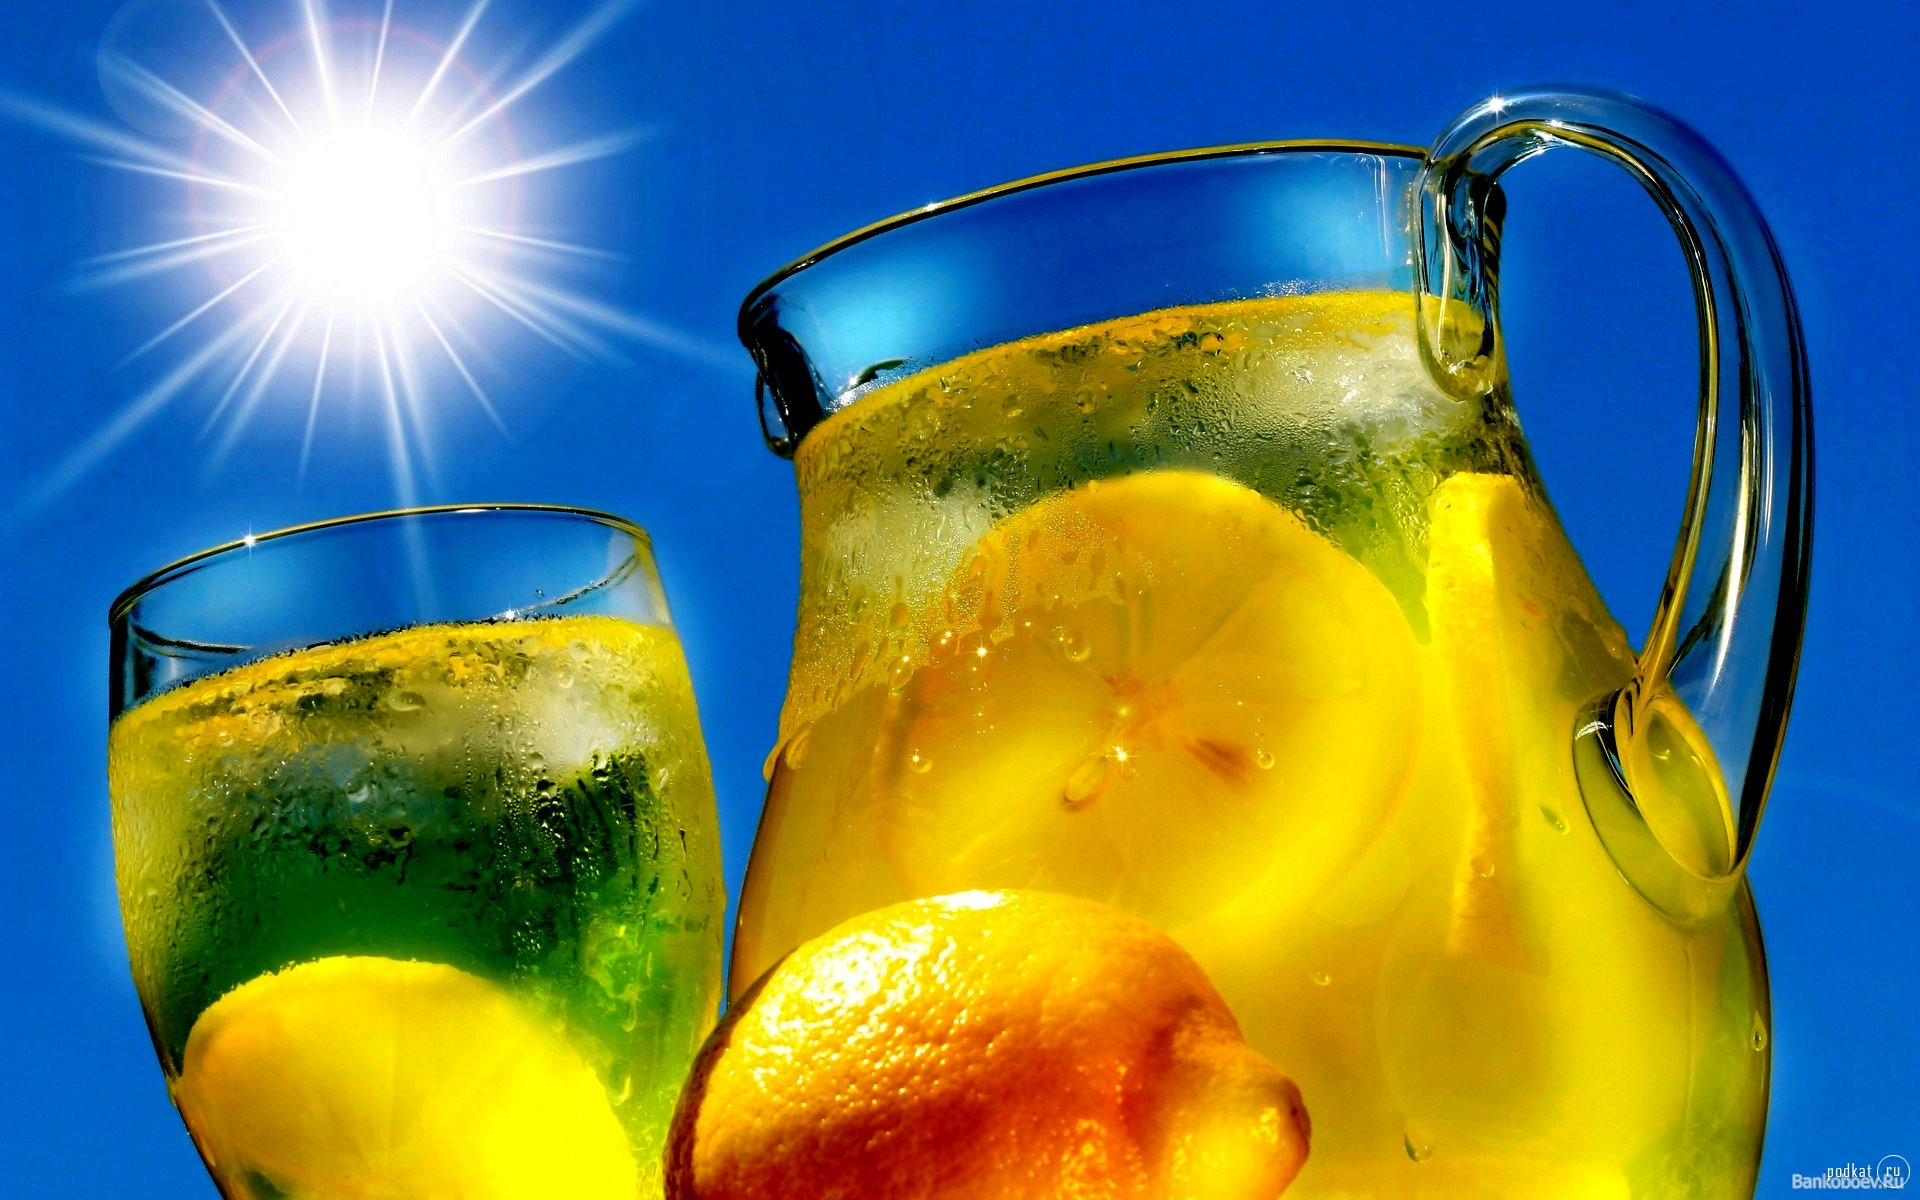 Lemon Juice Wallpaper ImageBankbiz 1920x1200